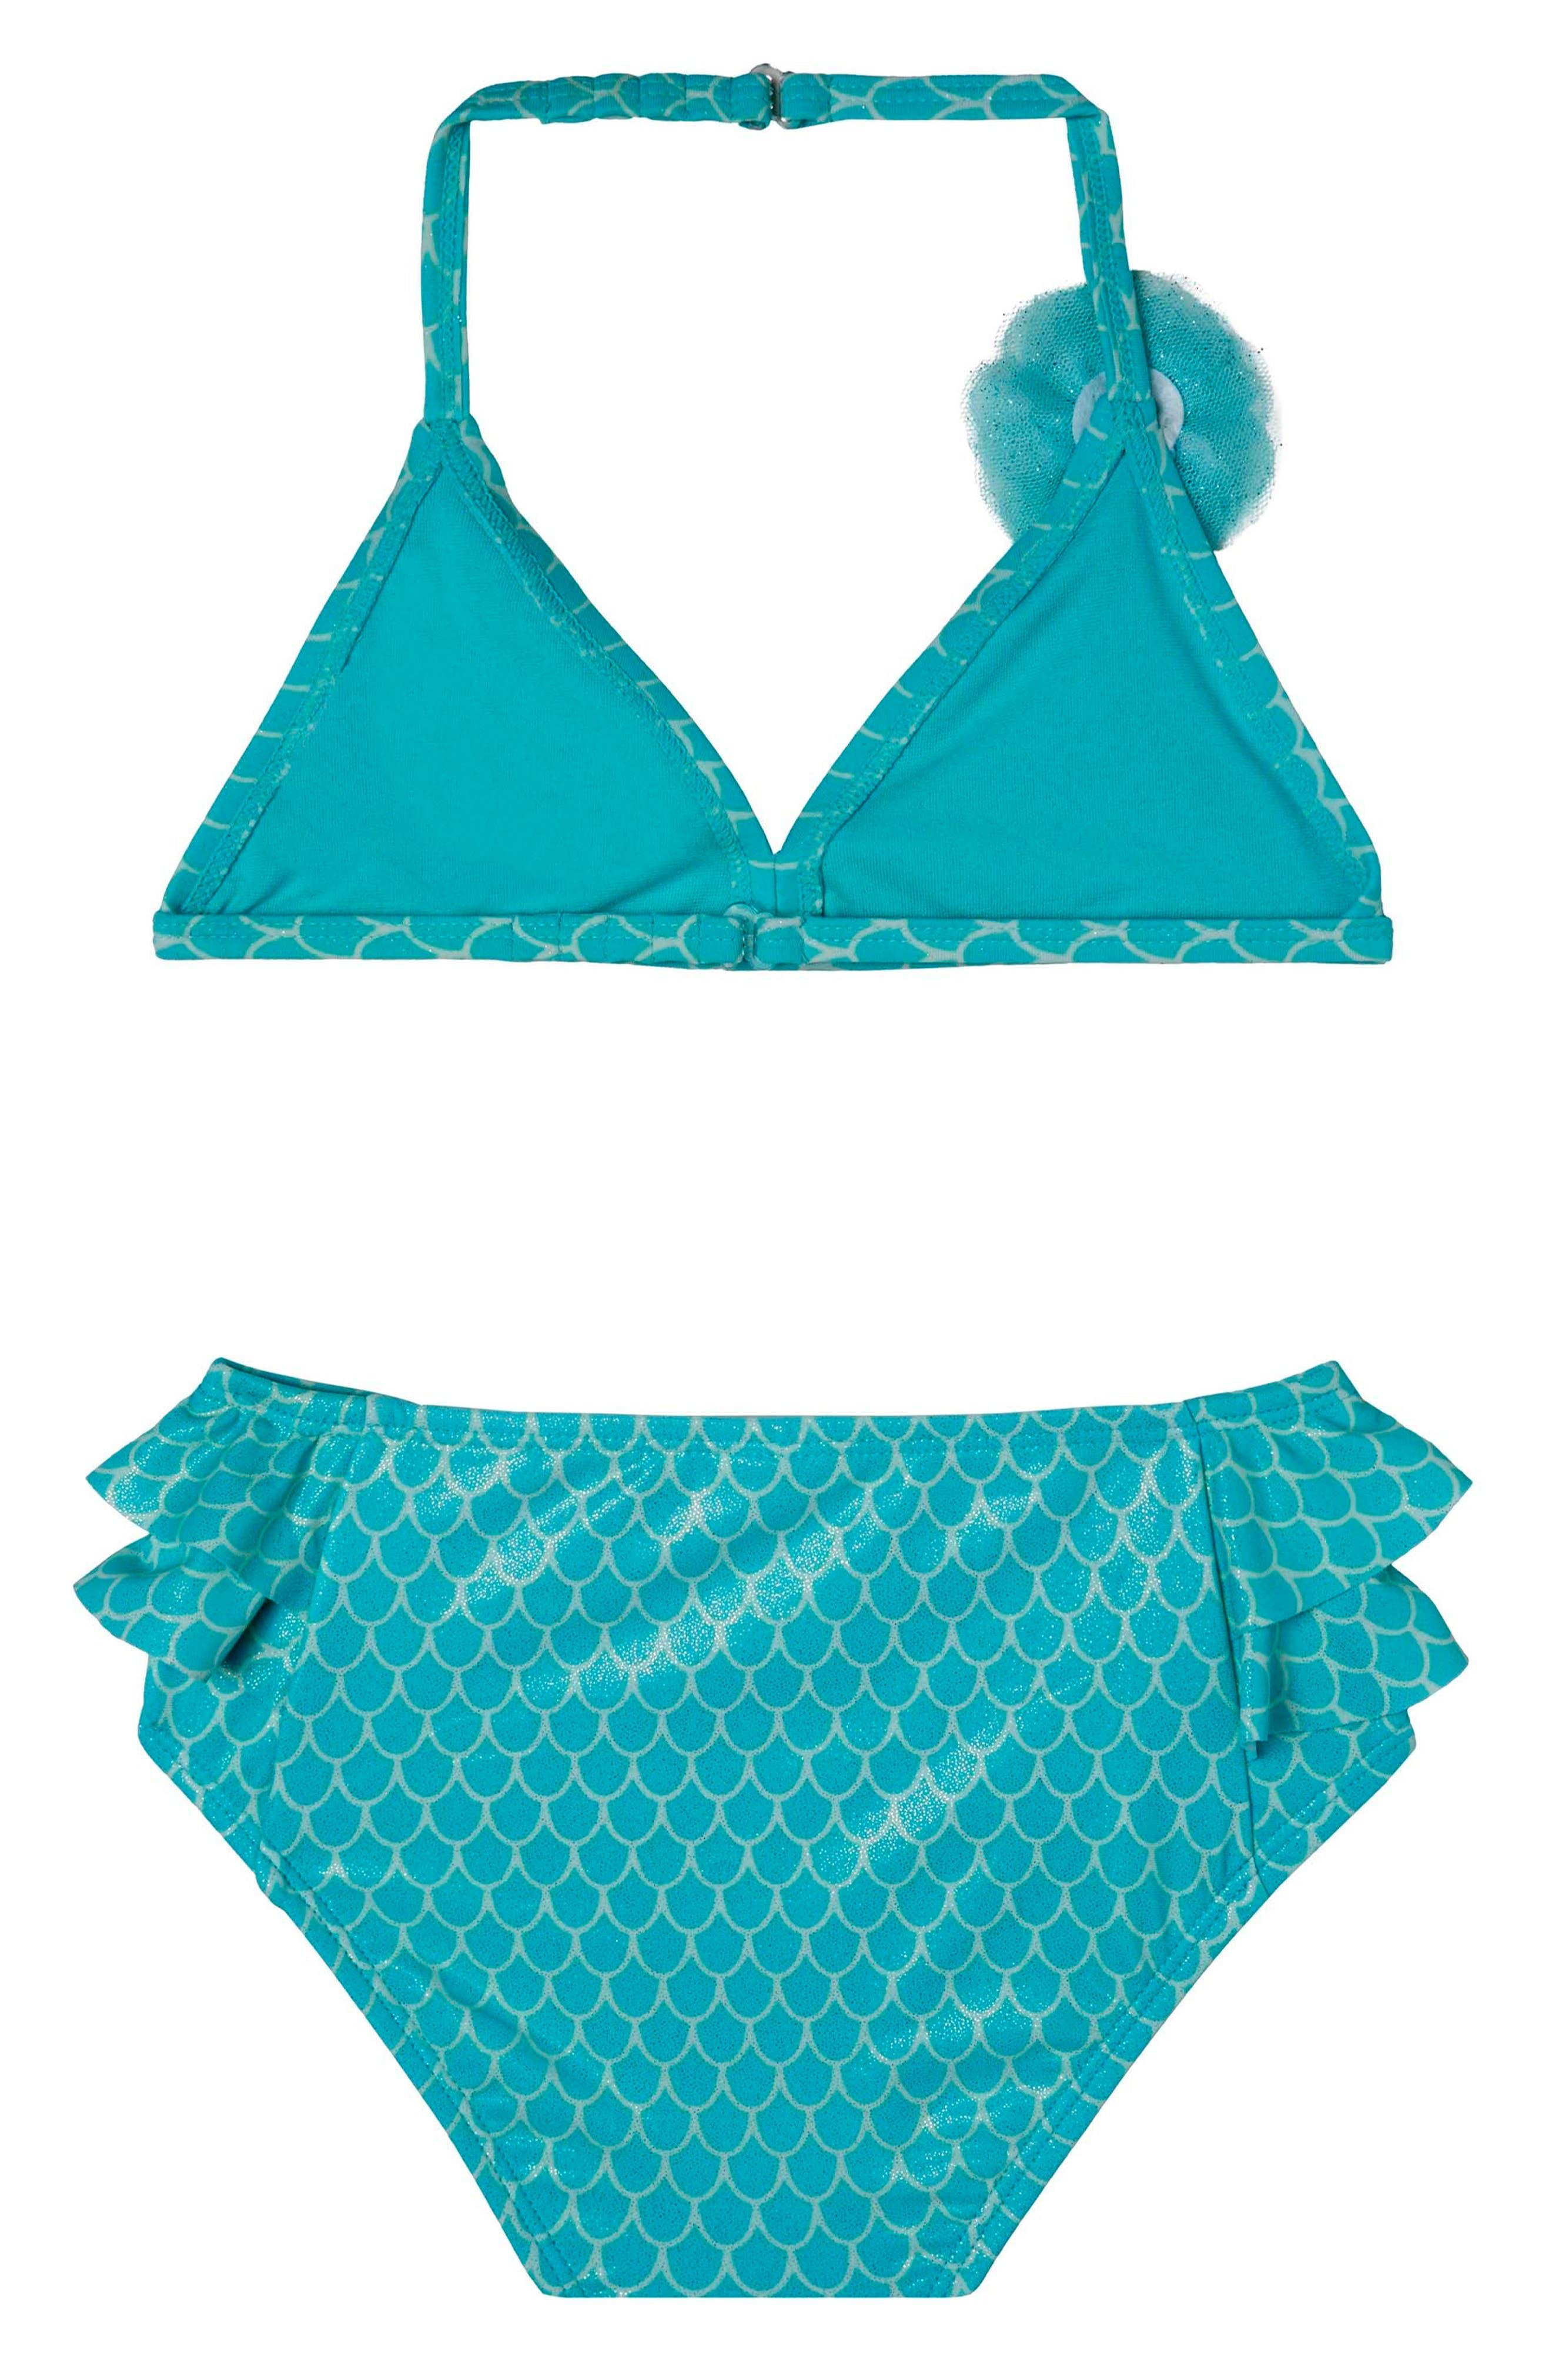 Mermaid Princess Two-Piece Swimsuit,                         Main,                         color, 400